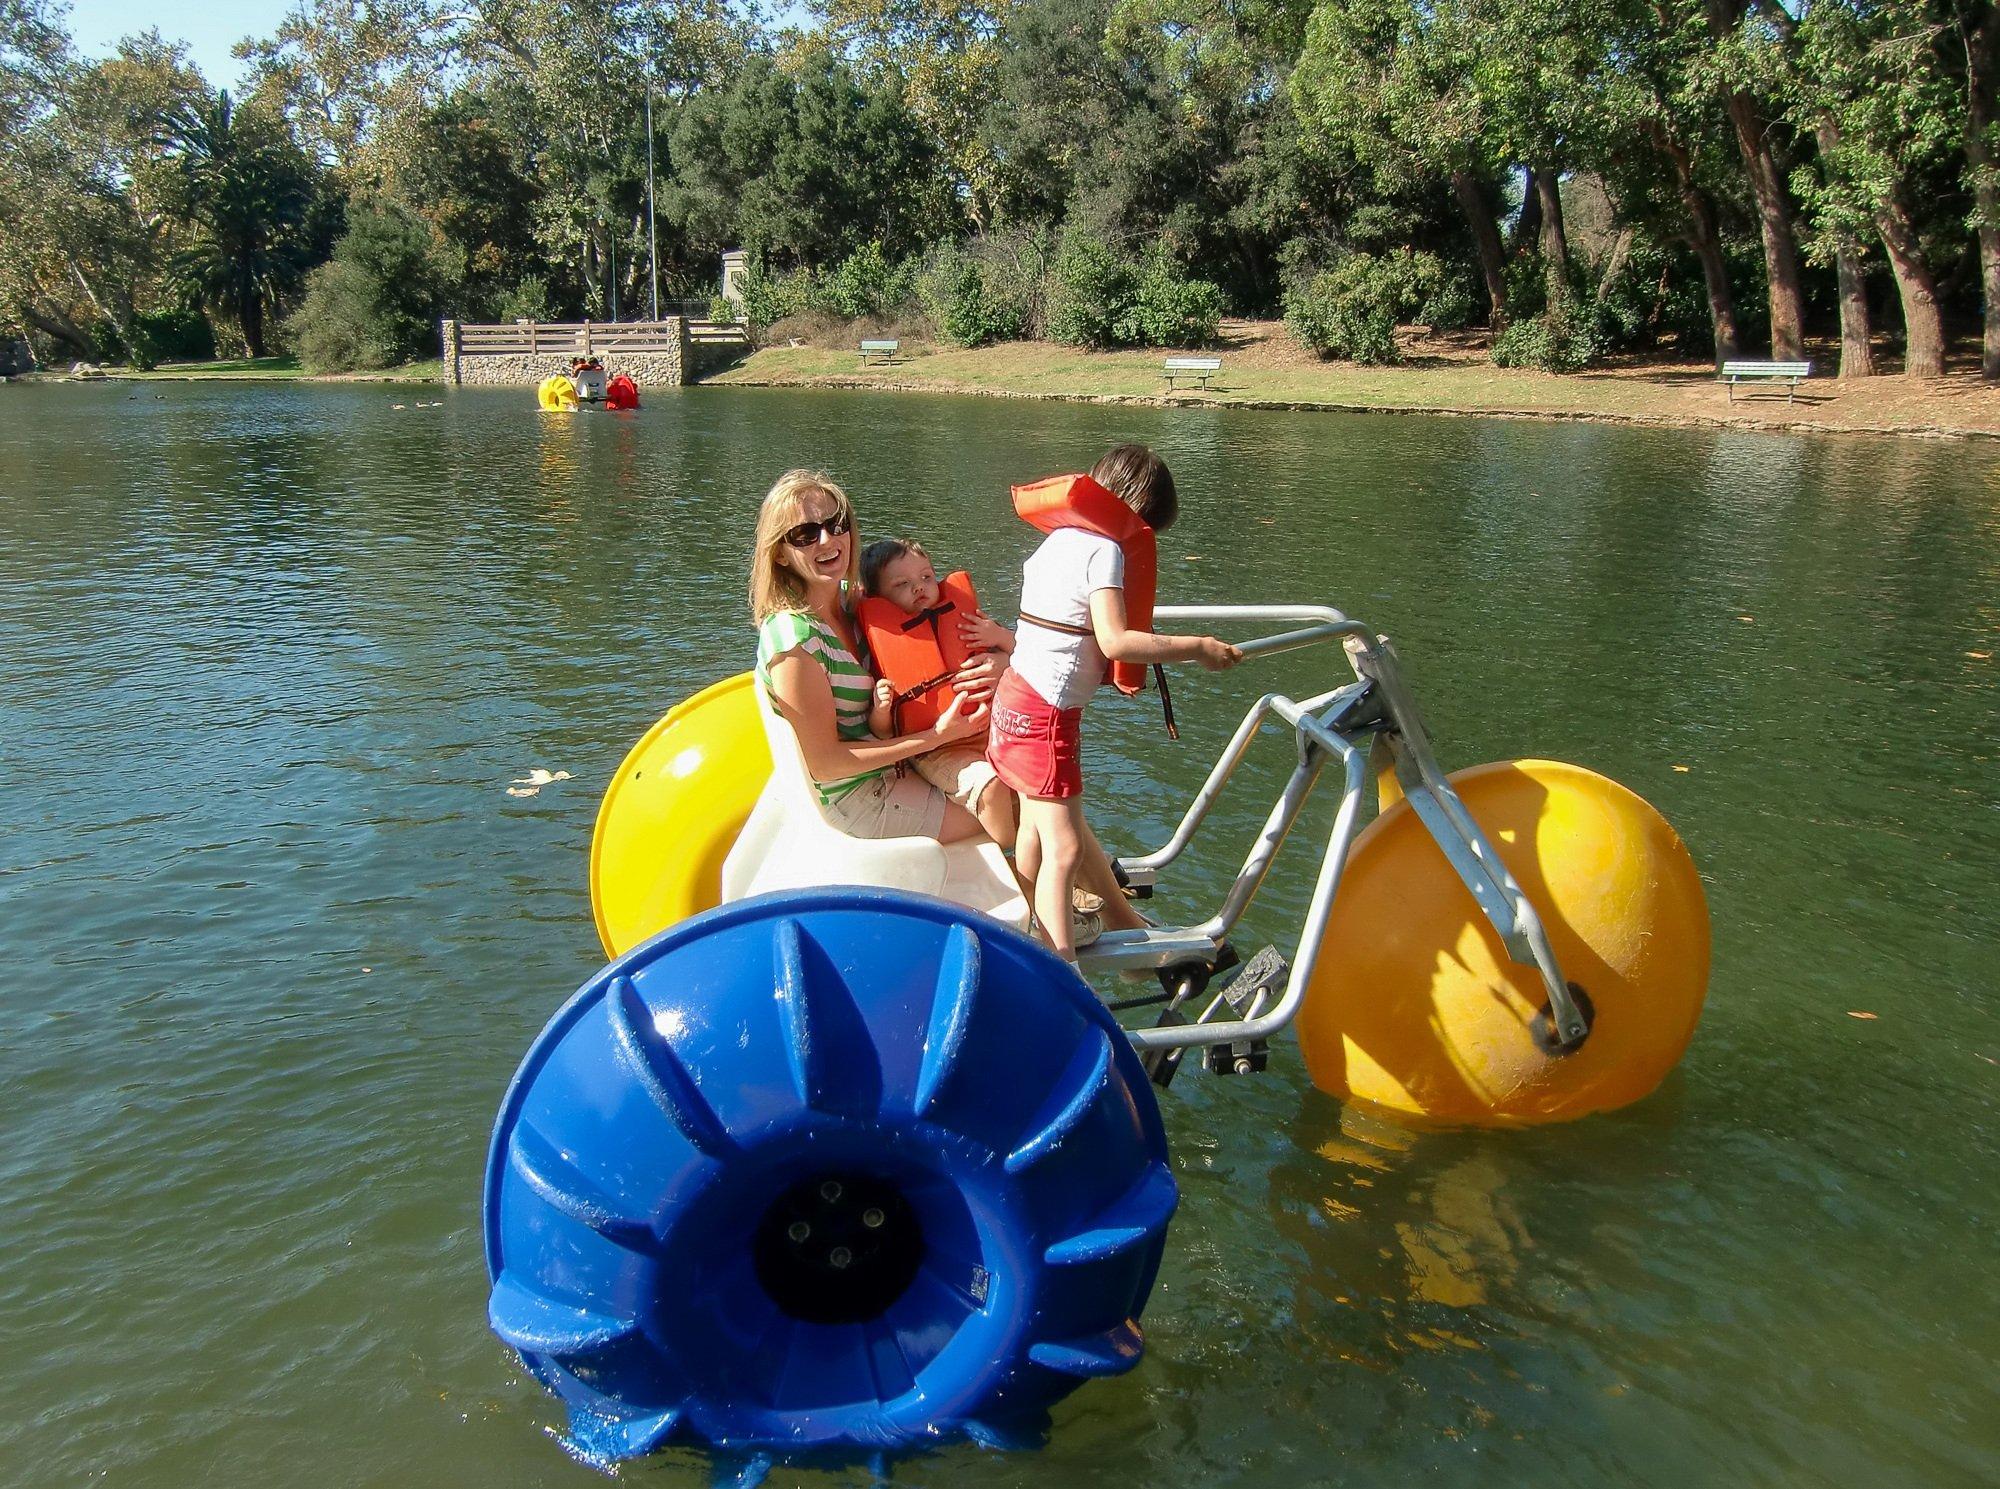 Irvine Regional Park in Orange County with kids